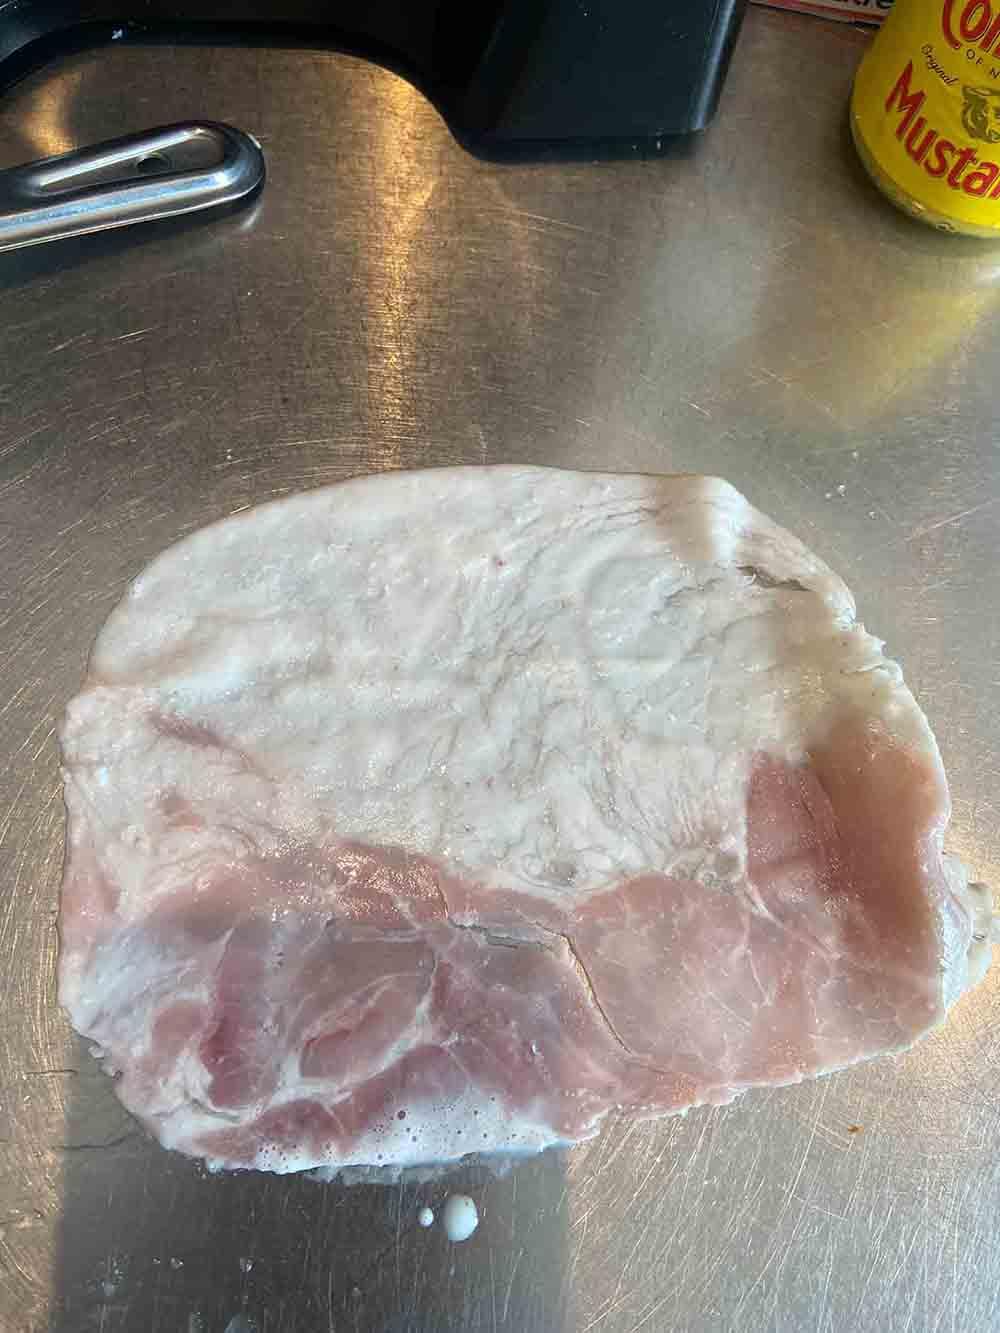 Aldi customer slams supermarket for fatty ham - Consumer News